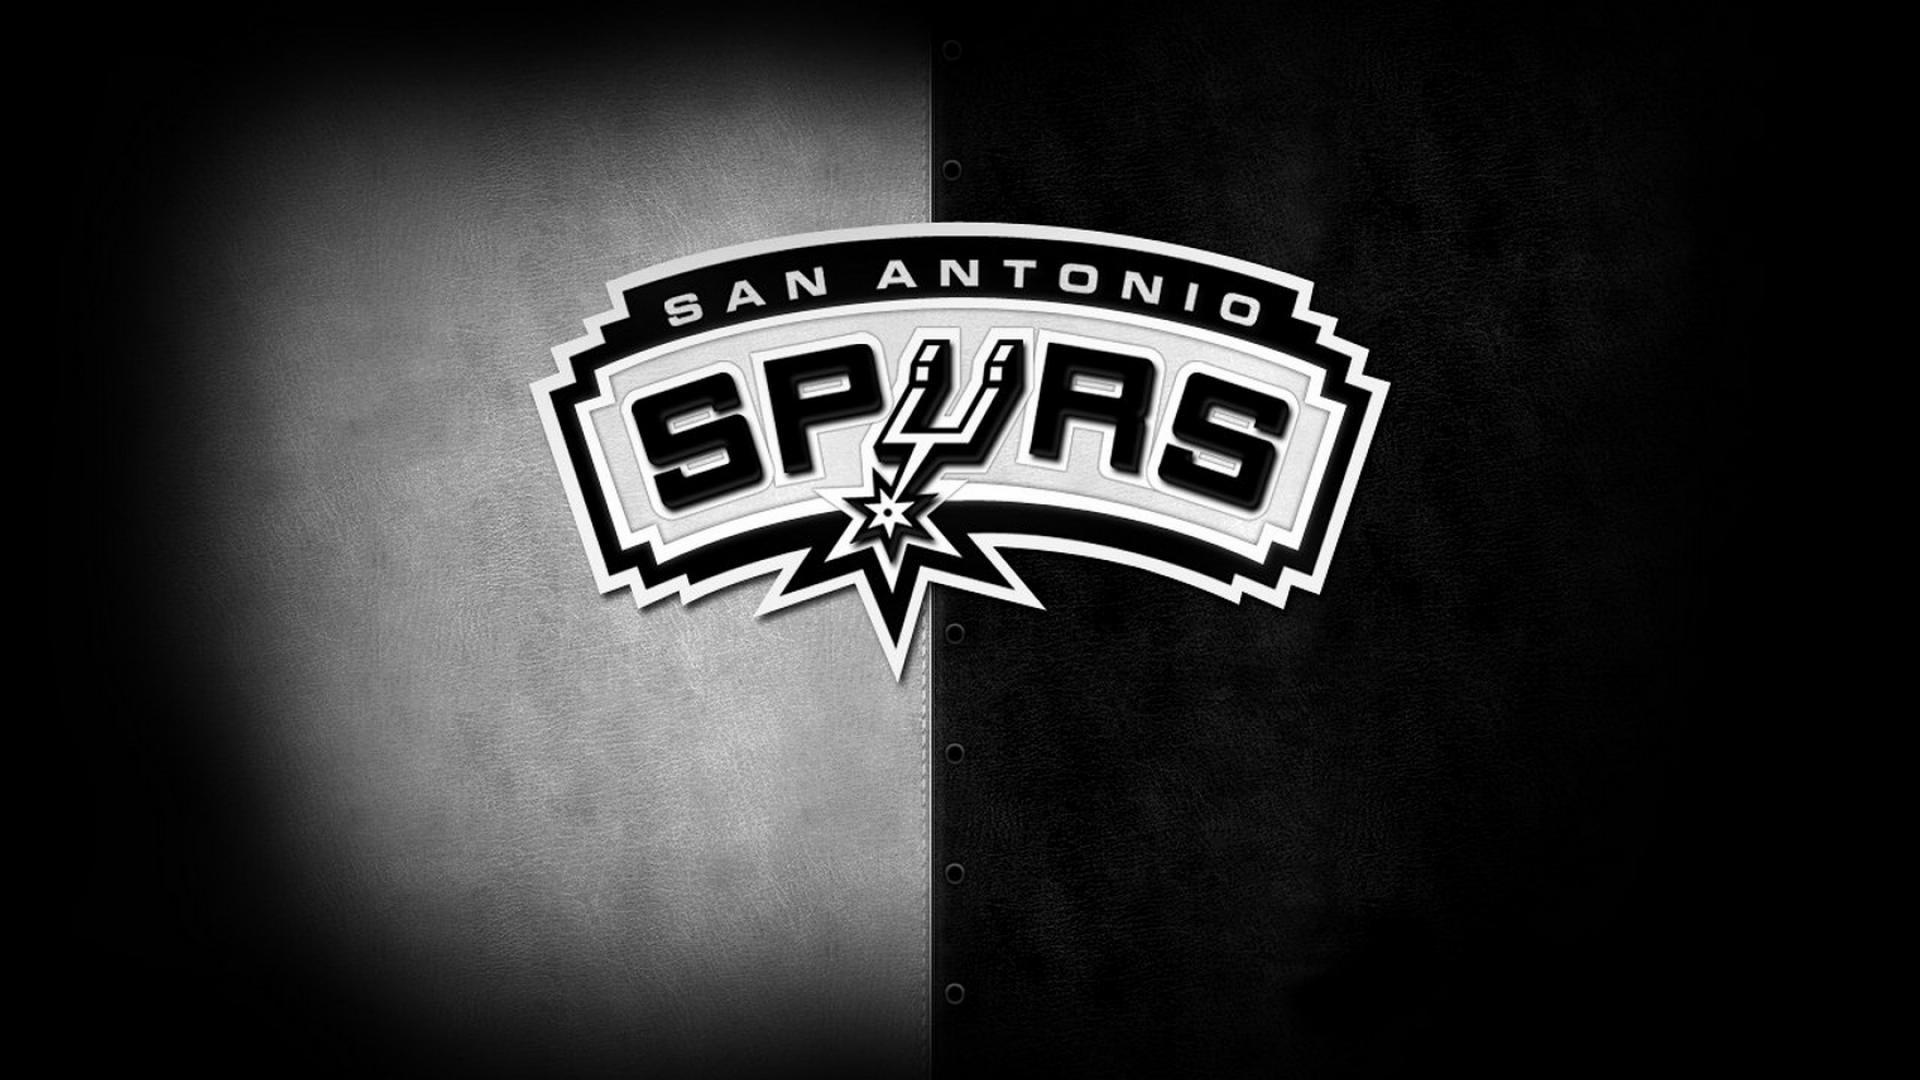 Logo Wallpapers San Desktop Antonio Spurs